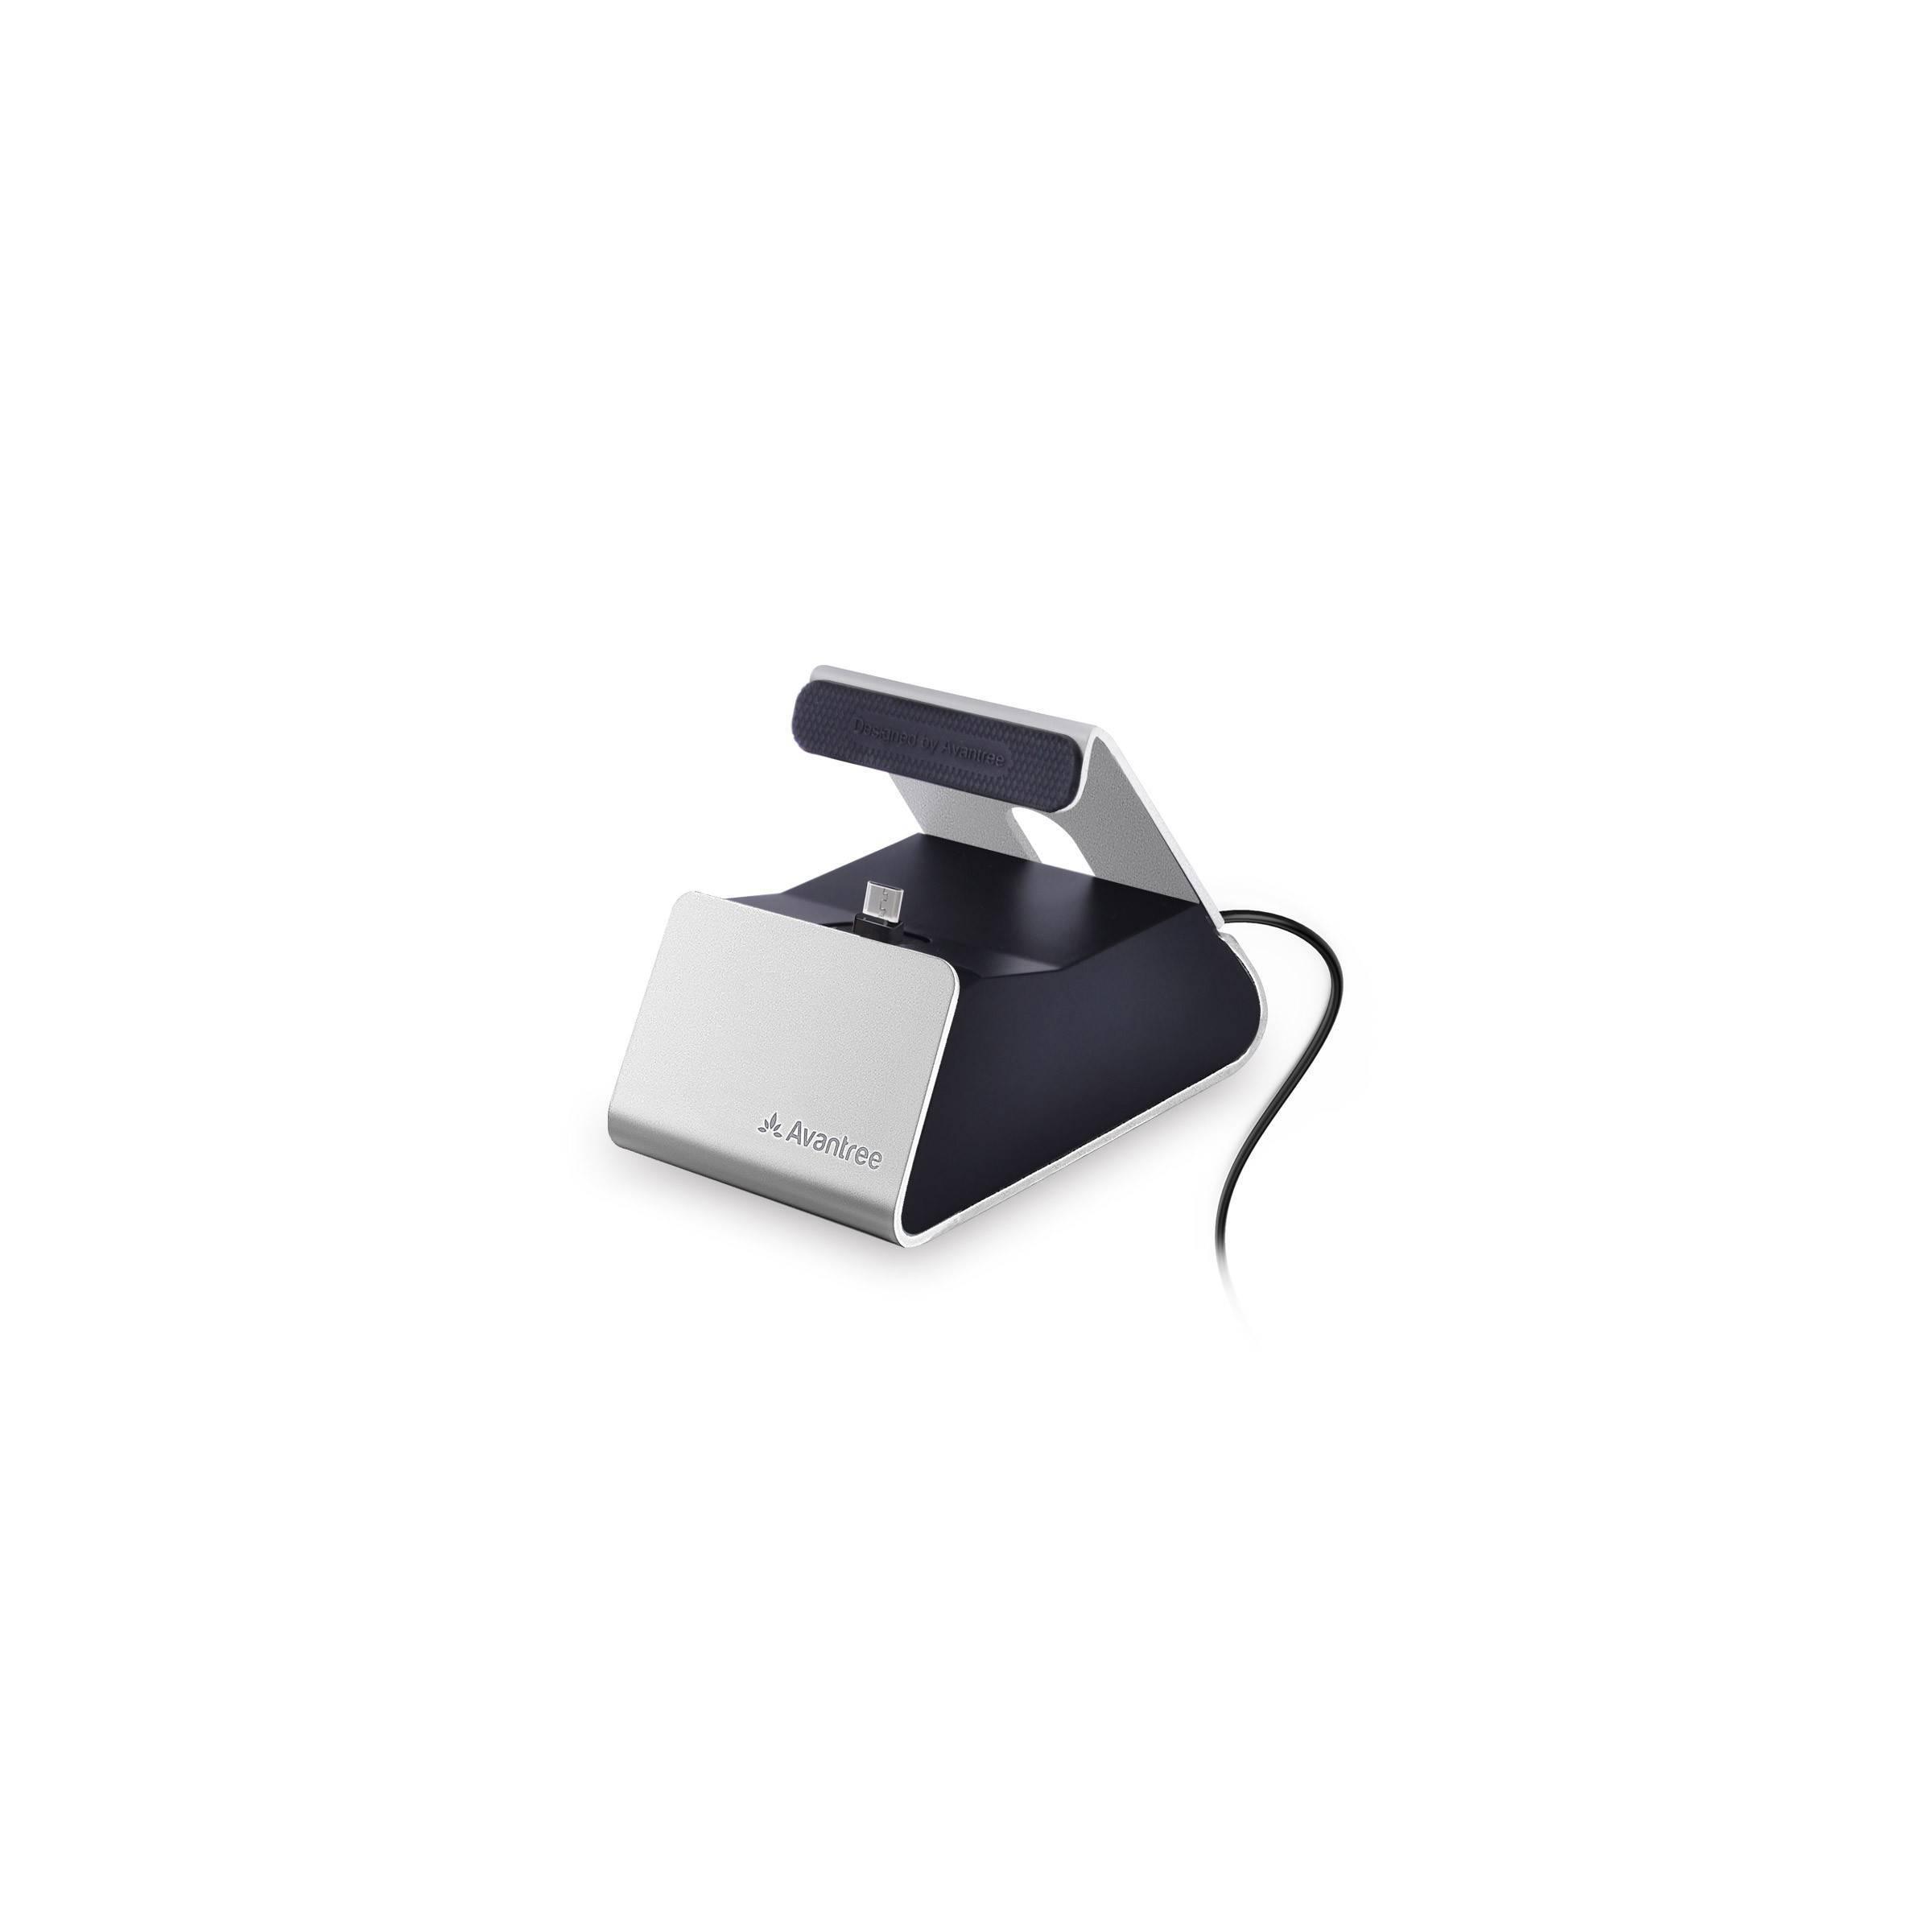 Avantree micro usb charge dock i sølv/sort fra avantree på mackabler.dk